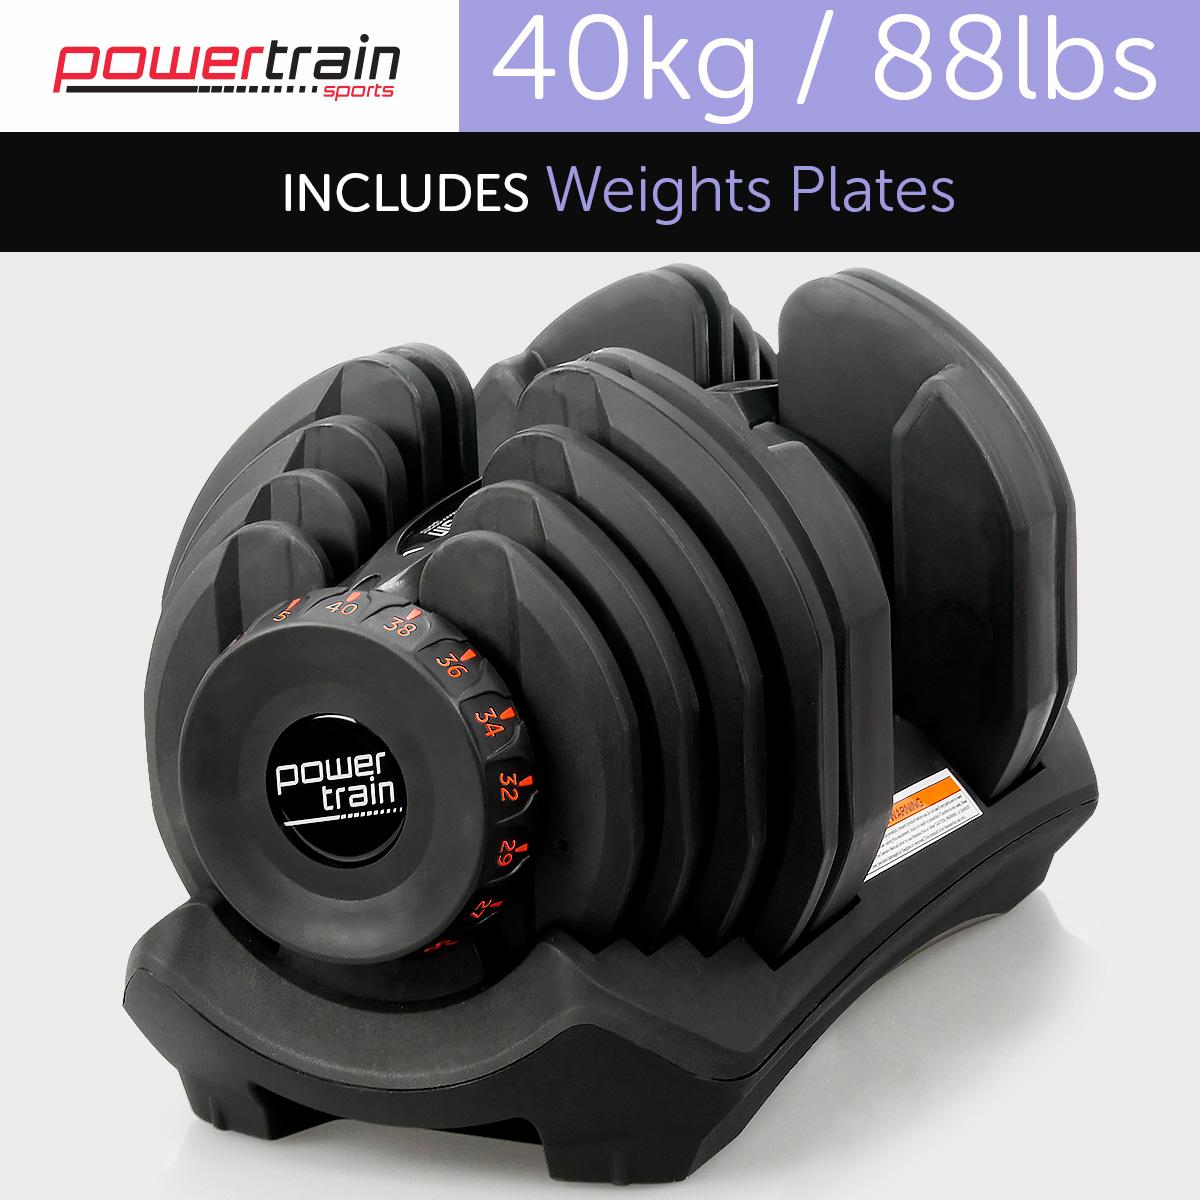 40kg Powertrain Home Gym Adjustable Dumbbell